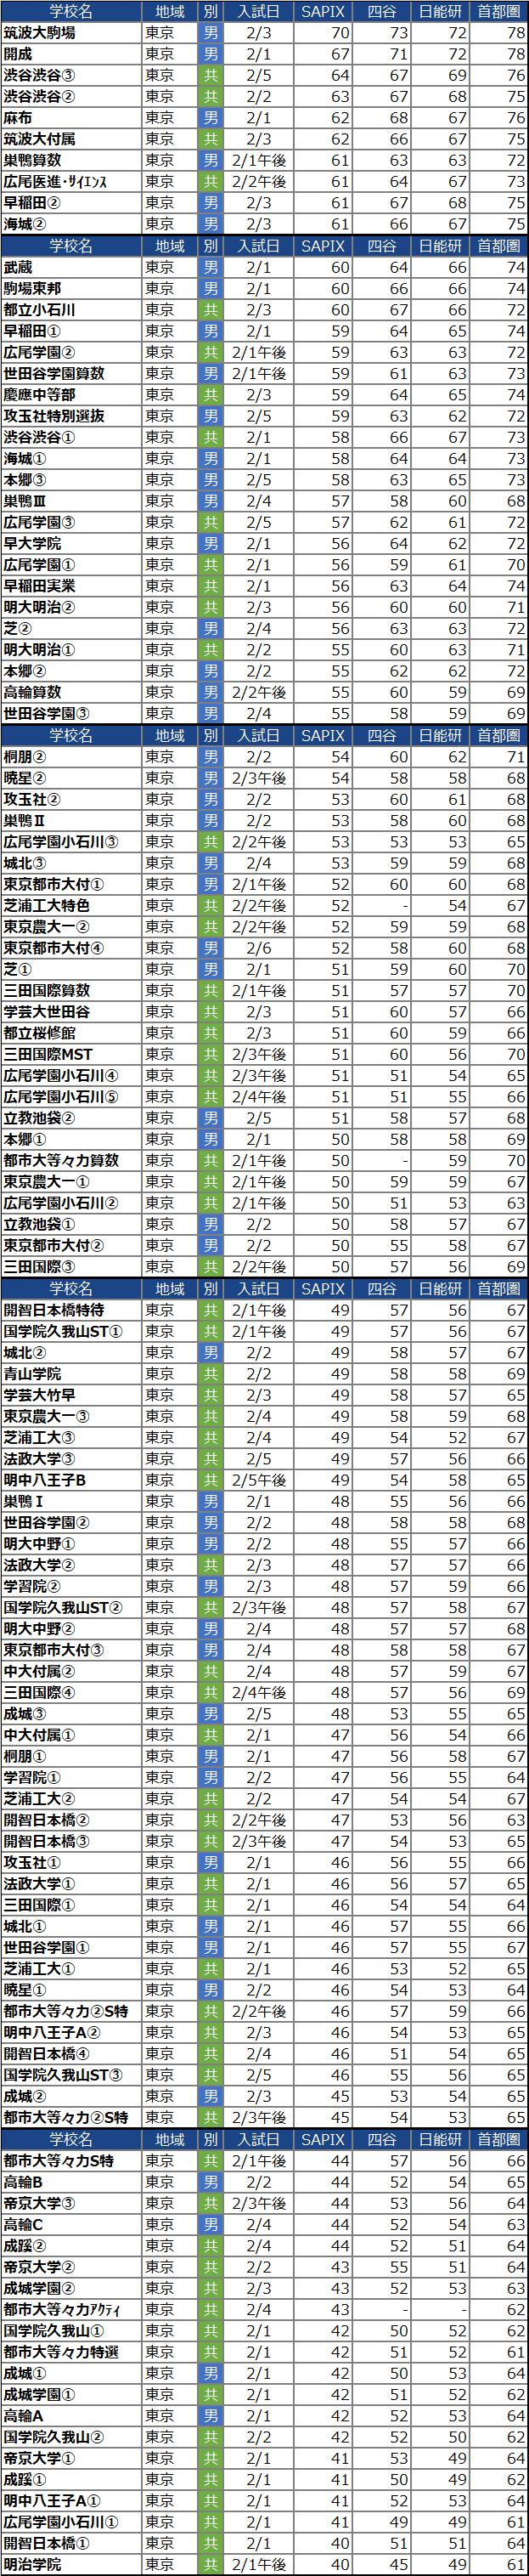 【中学受験2022】東京の中学校の偏差値ランキング(SAPIX・四谷大塚・日能研・首都模試)男子